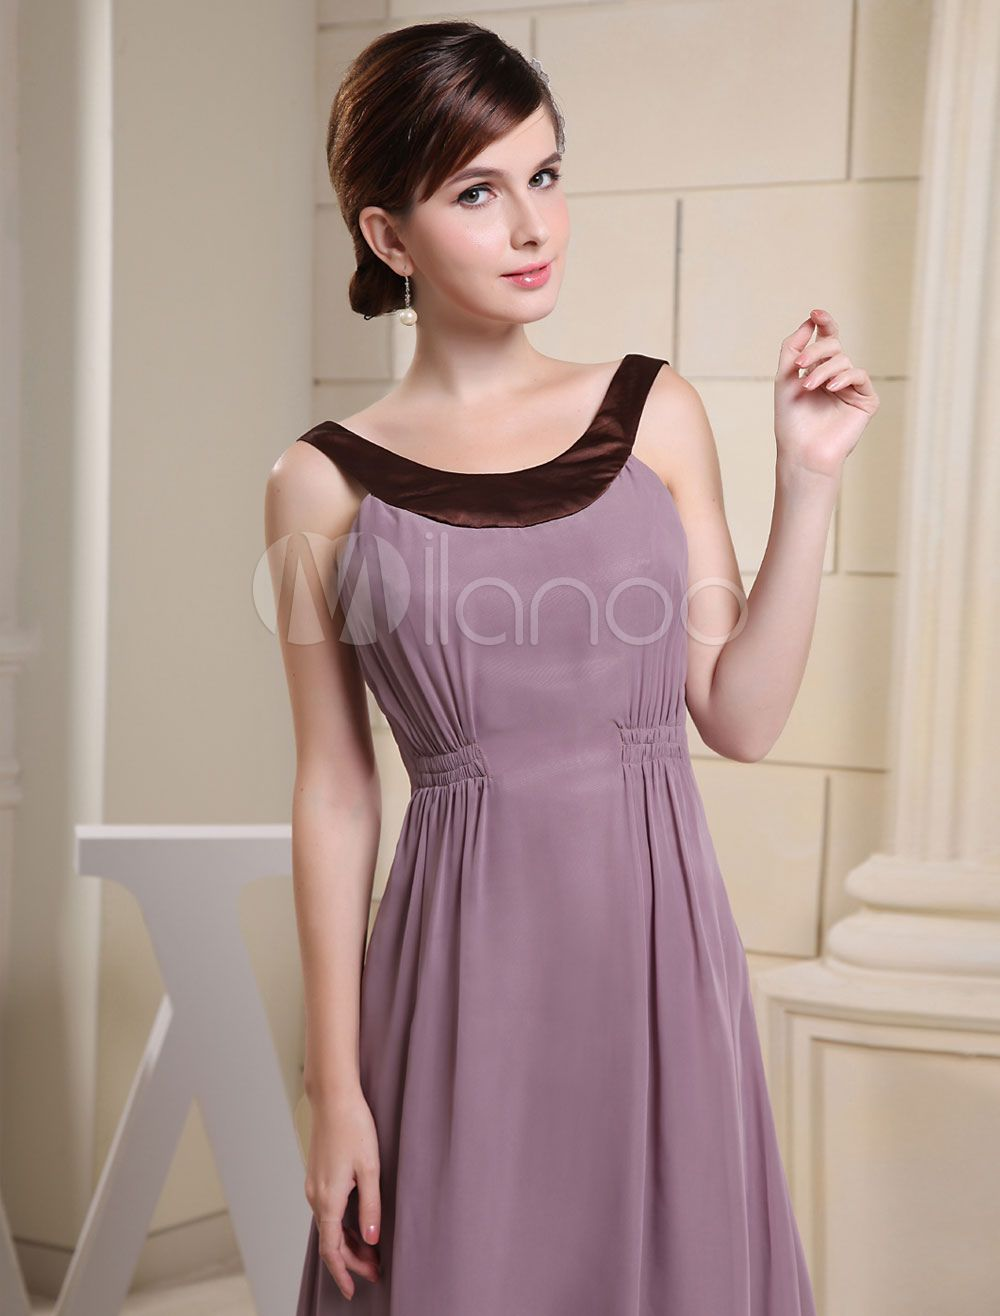 ab0adb08db9 Lavender Evening Dress Jewel Neckline Elastic Pleated Court Train Chiffon  Wedding Party Dress  Jewel